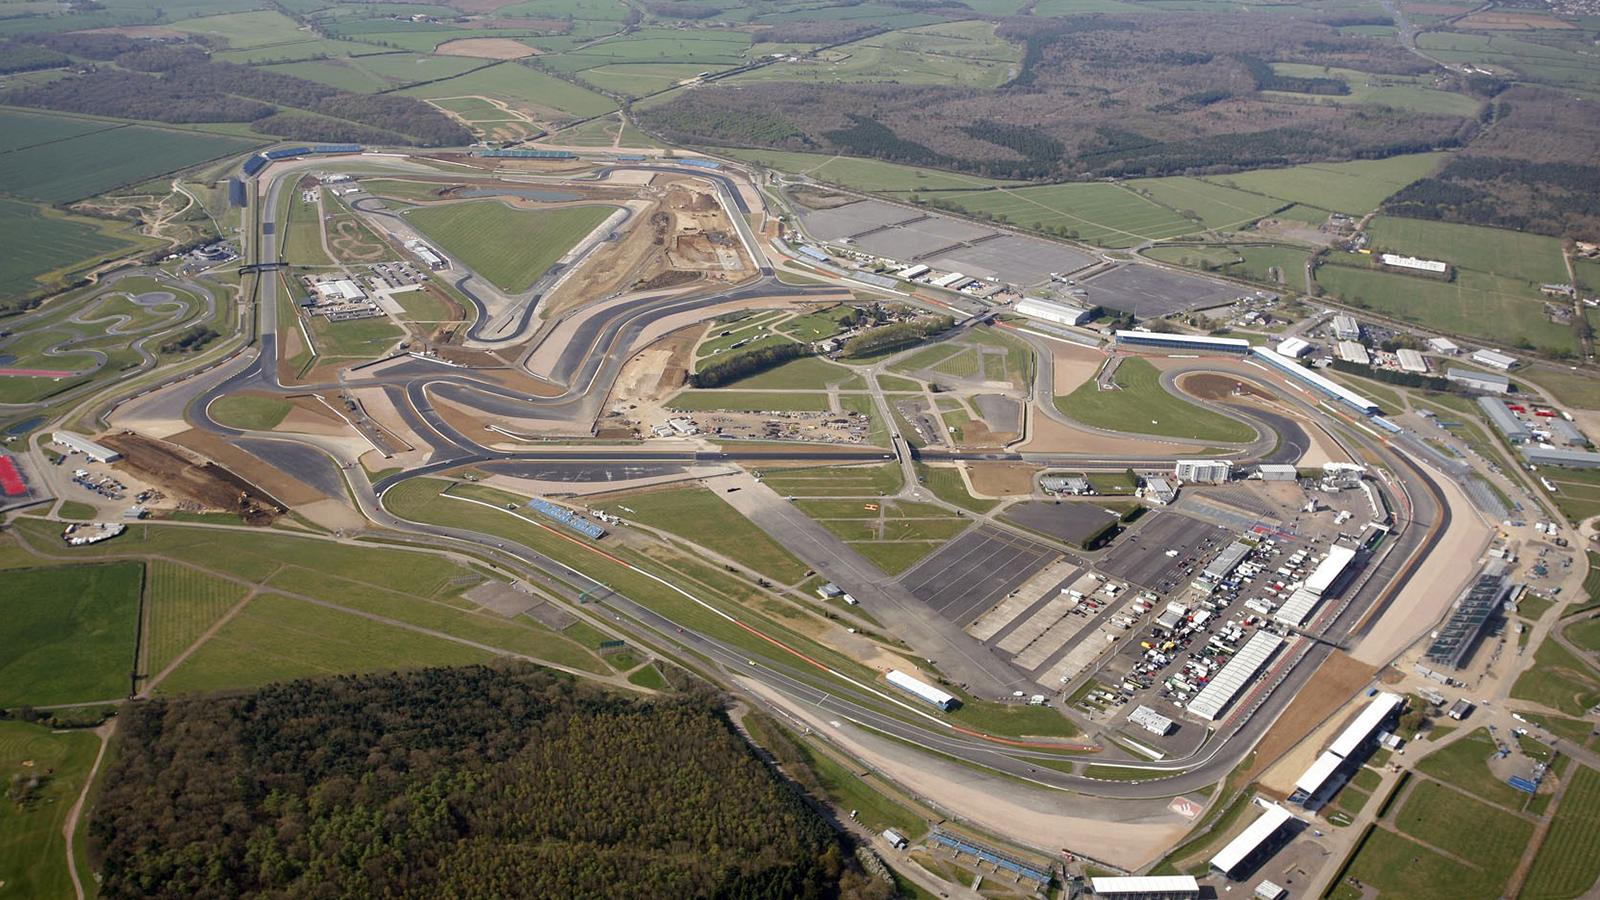 Silverstone, England - Round Six, 28 - 30 September 2018, Silverstone, England.Pure McLaren GT Series> Read Race Report